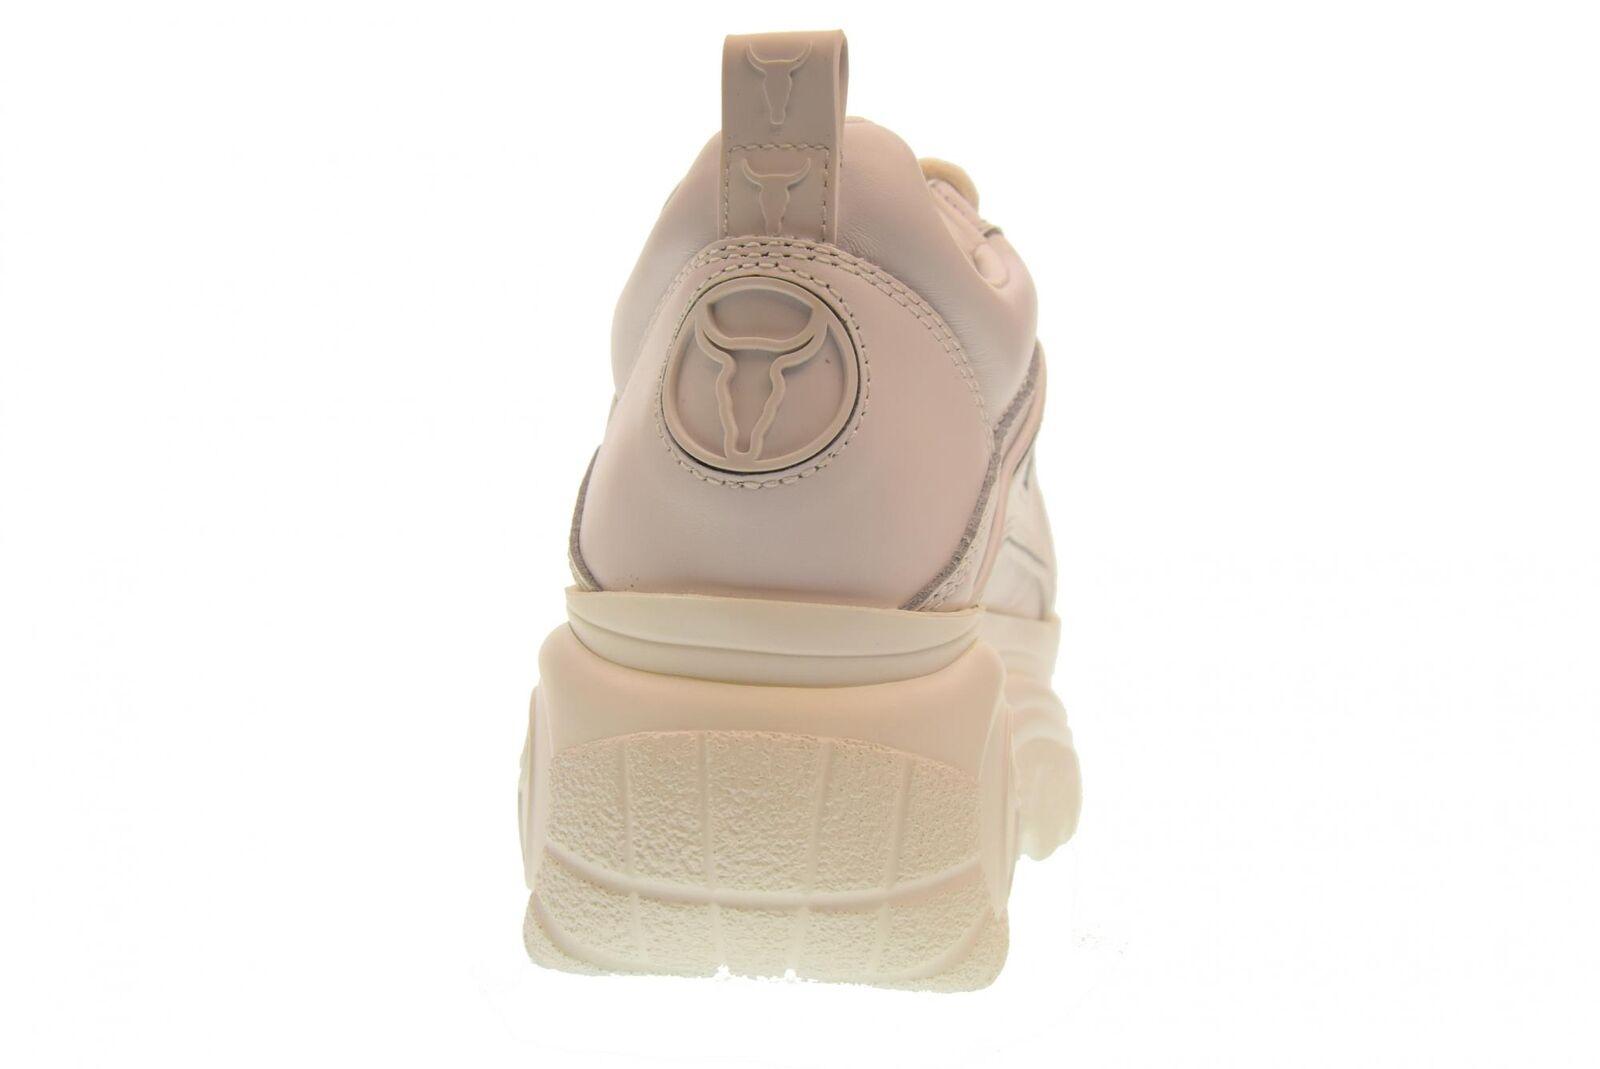 Windsor Windsor Windsor Smith A18s zapatillas de deporte de women con silverforma LUPE BIANCO a73b9e